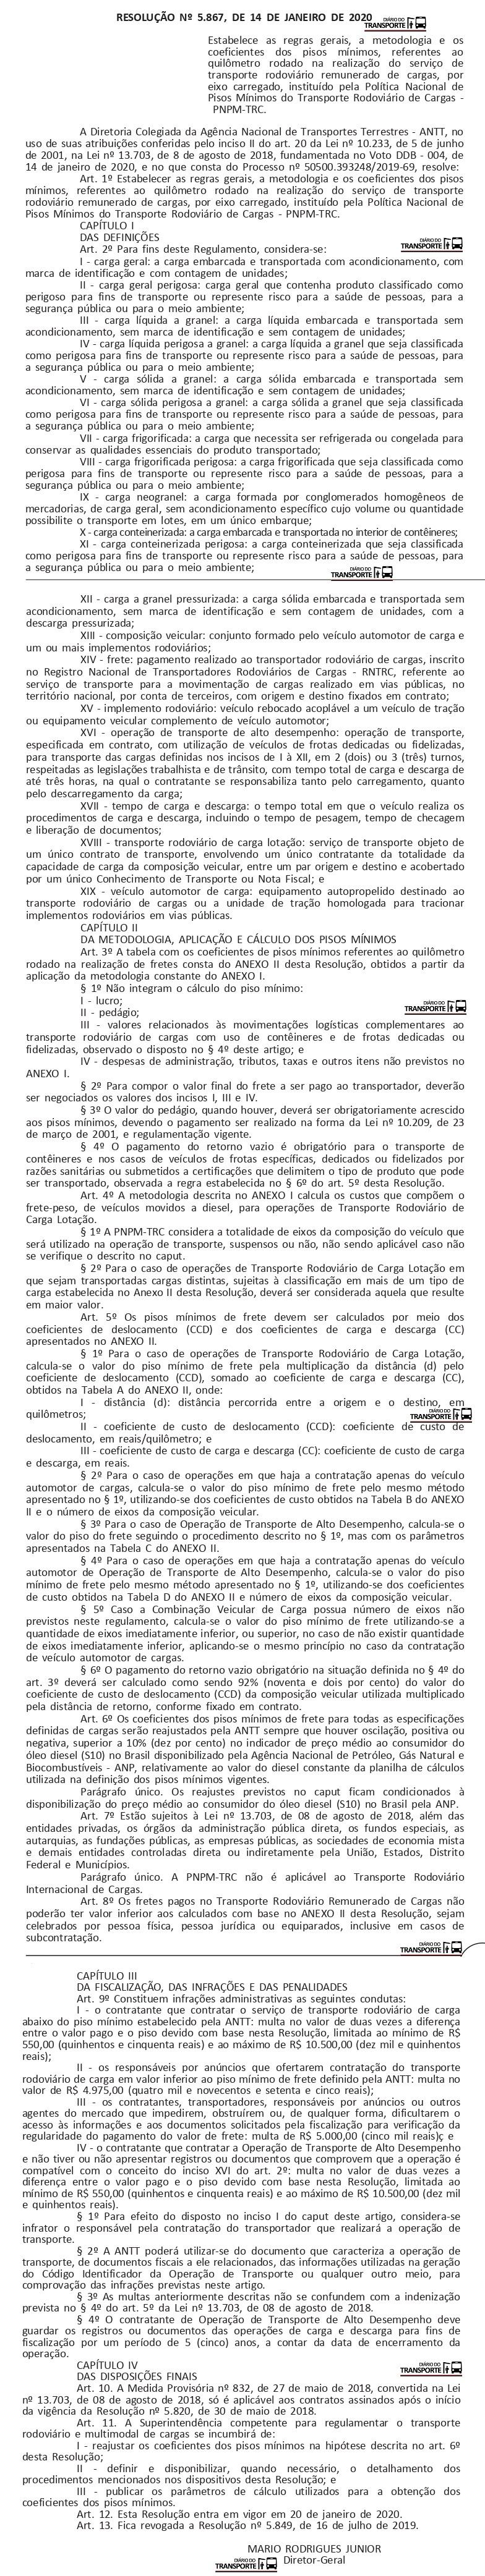 metodologia Piso Minimo 01_page-0001